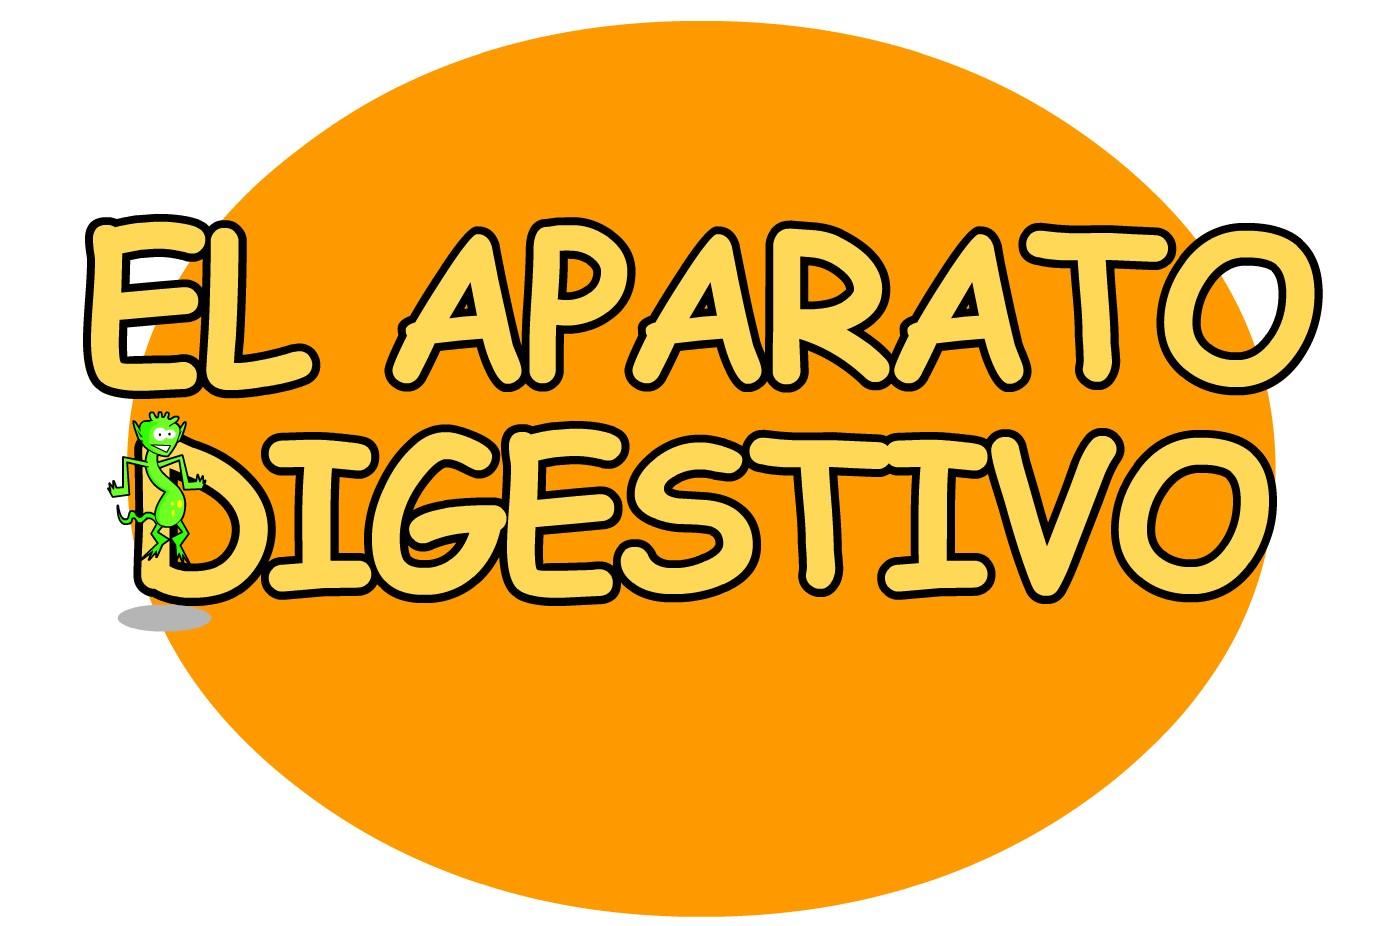 http://www.supersaber.com/digestivo.htm